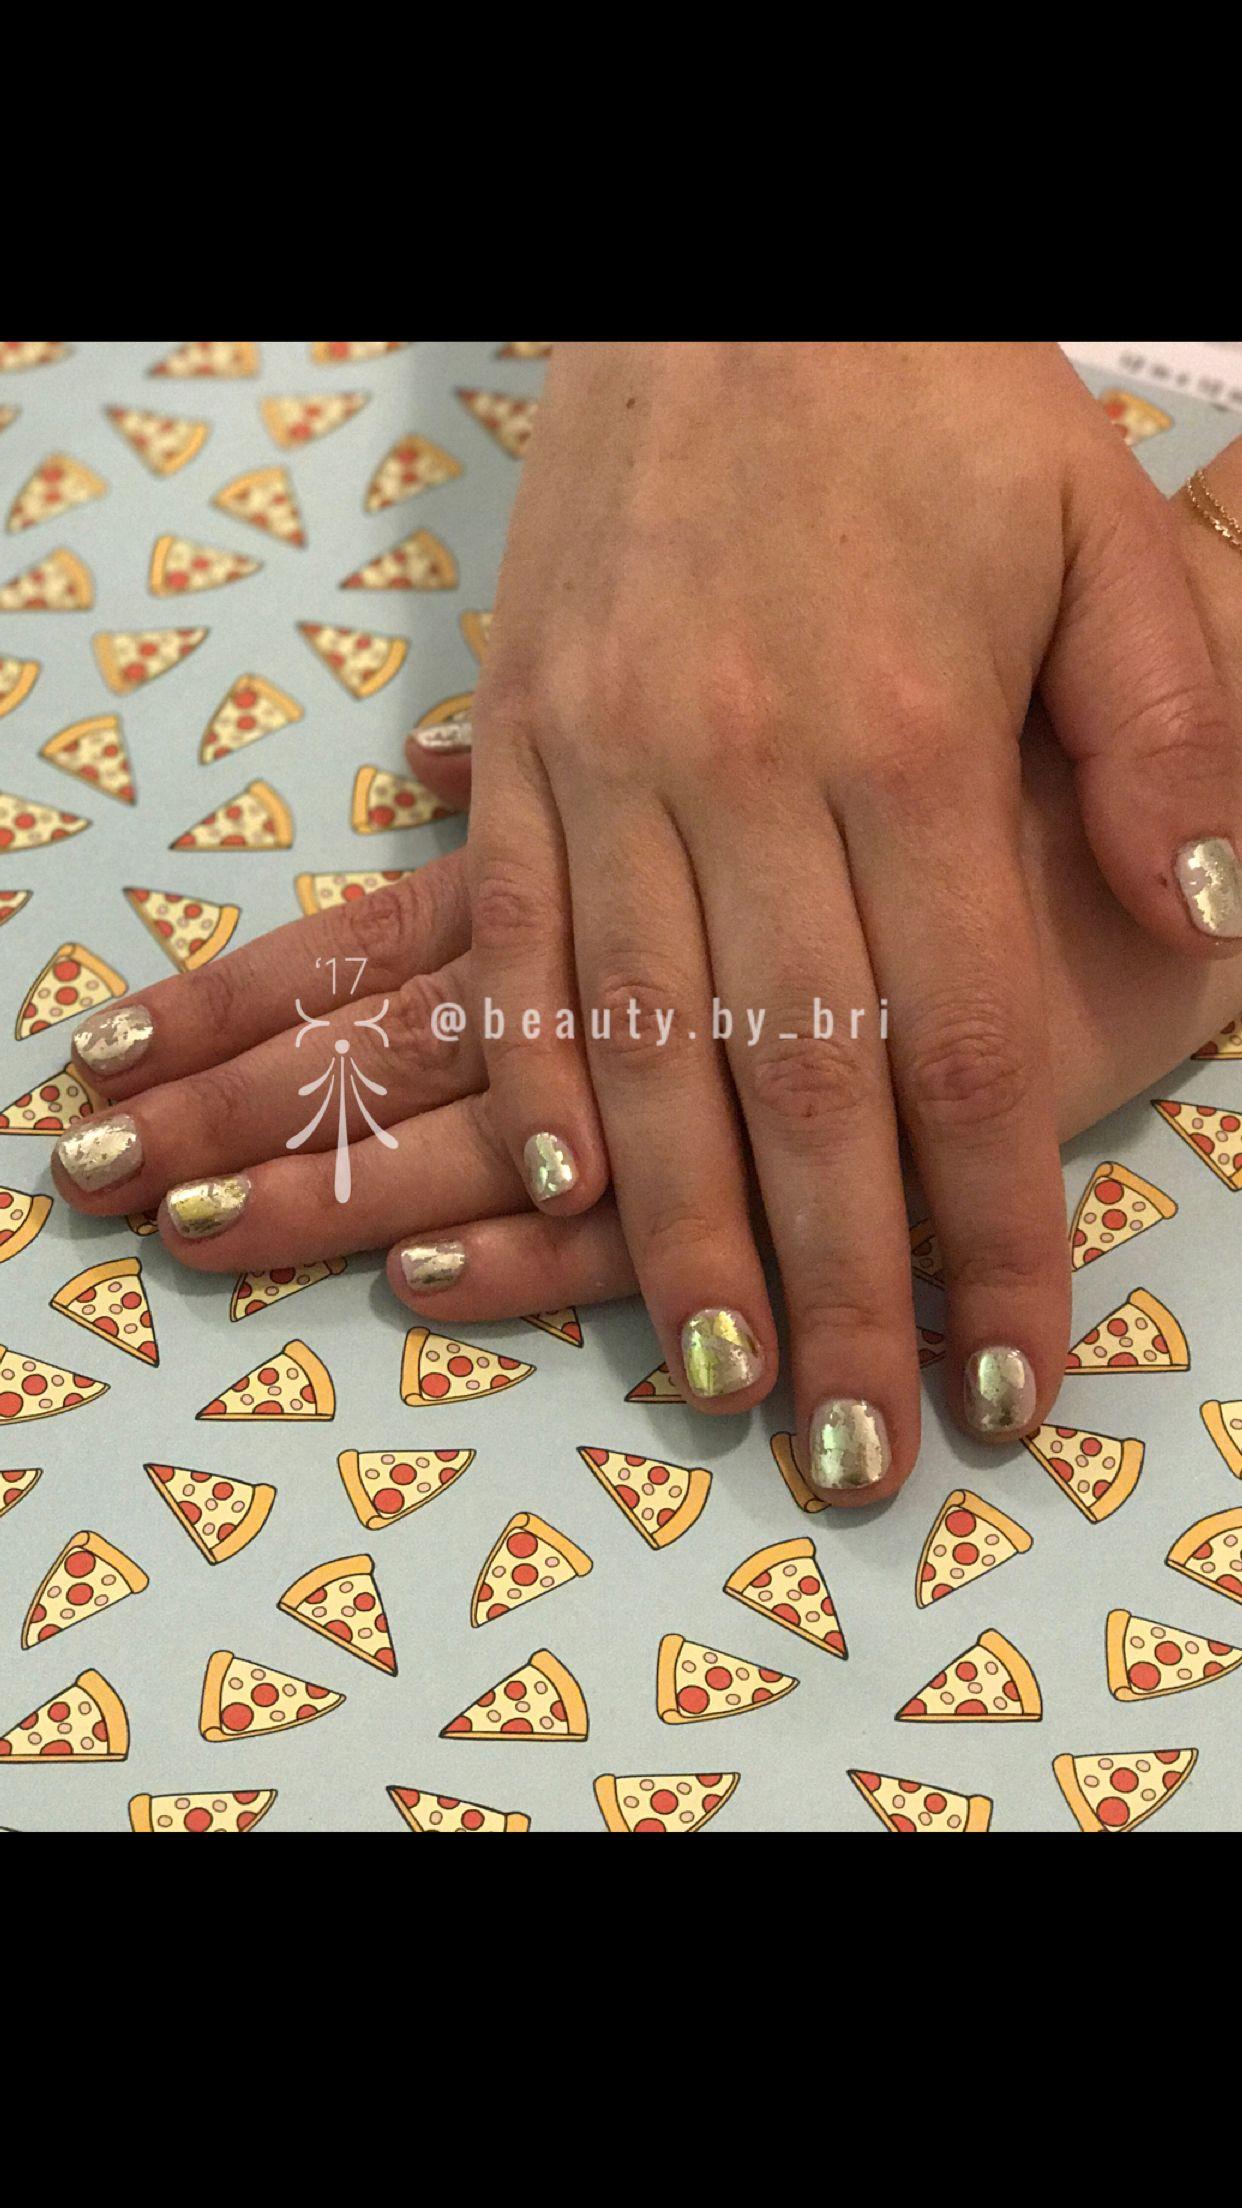 Gel manicure with foils! Foil nail art! Follow @beauty.by_bri on ...